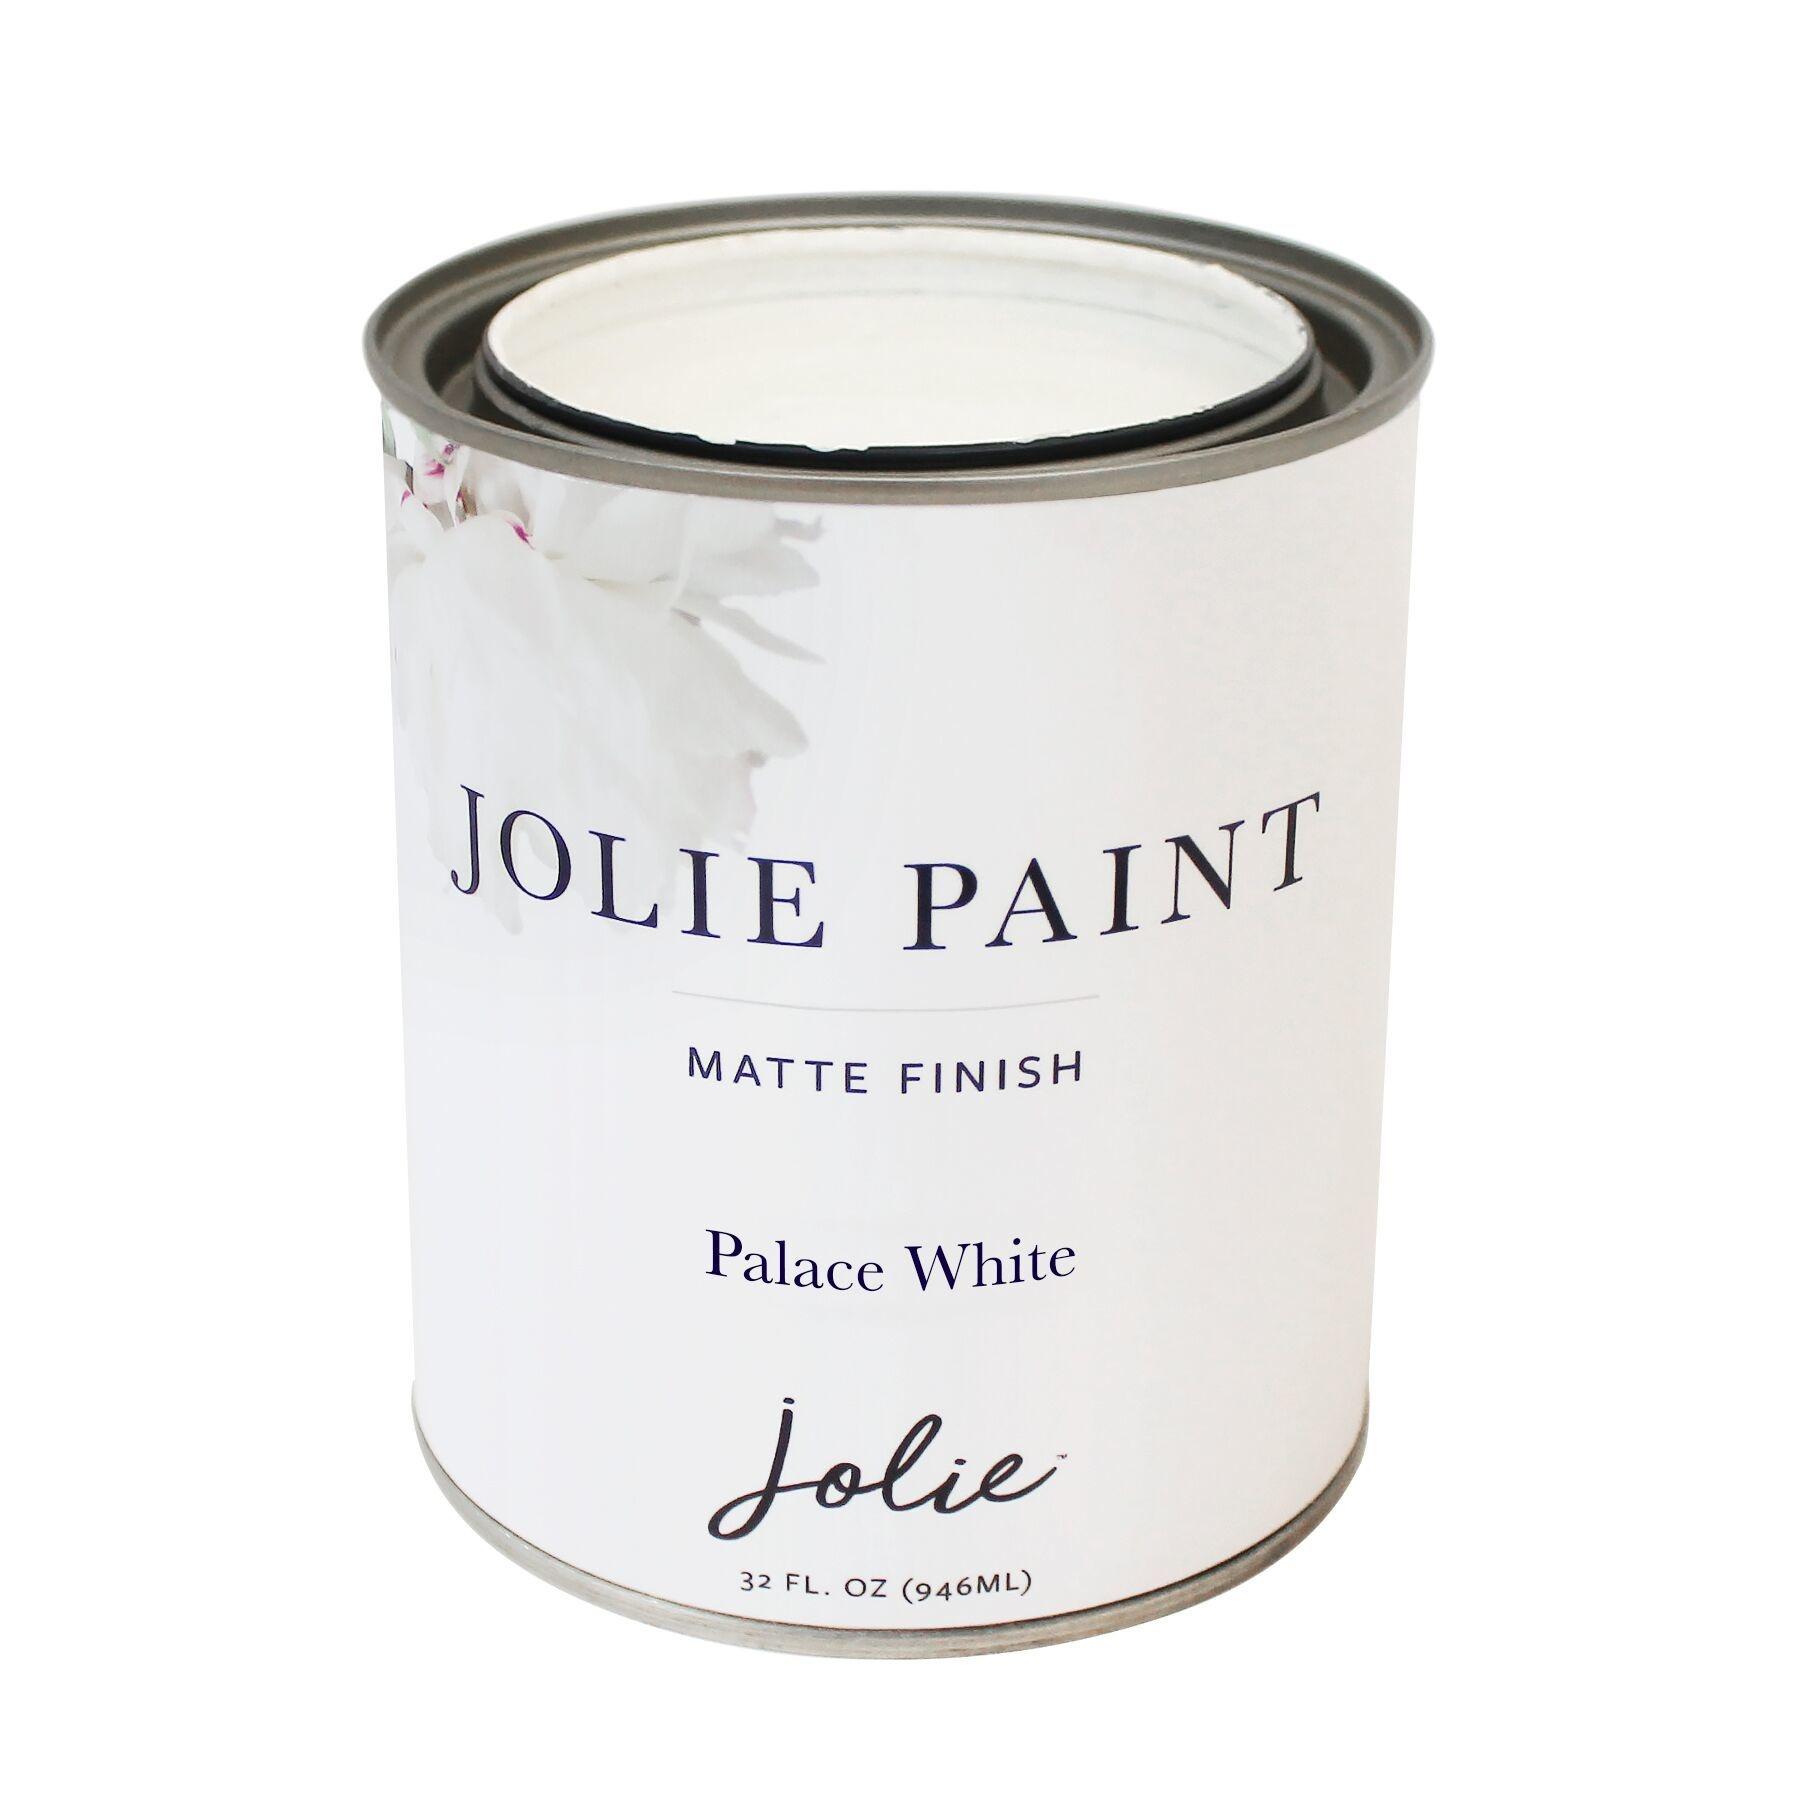 Jolie Home Palace White Matte Finish Paint